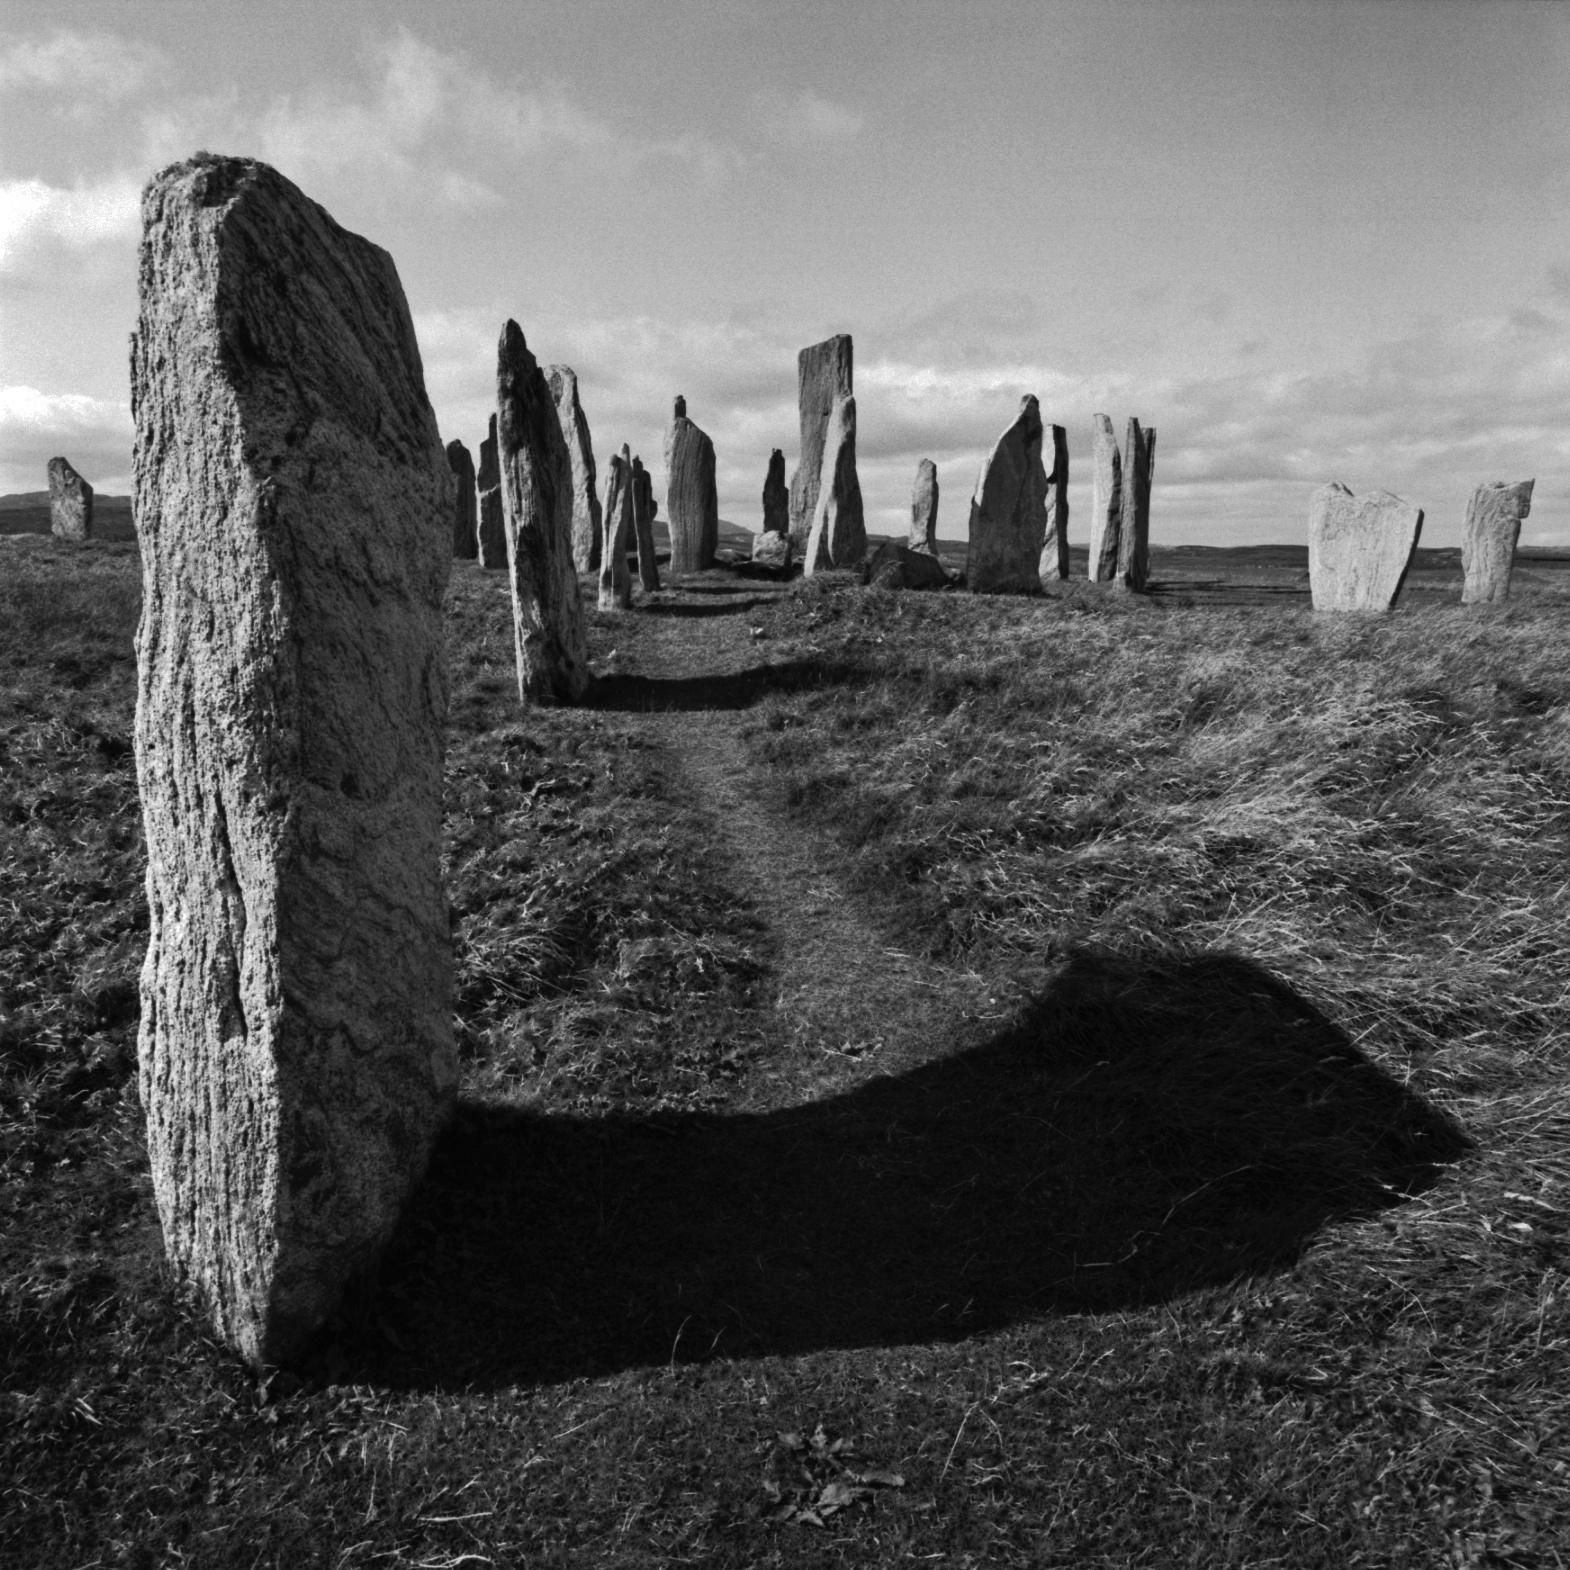 Standing Stones, Callanish, Lewis